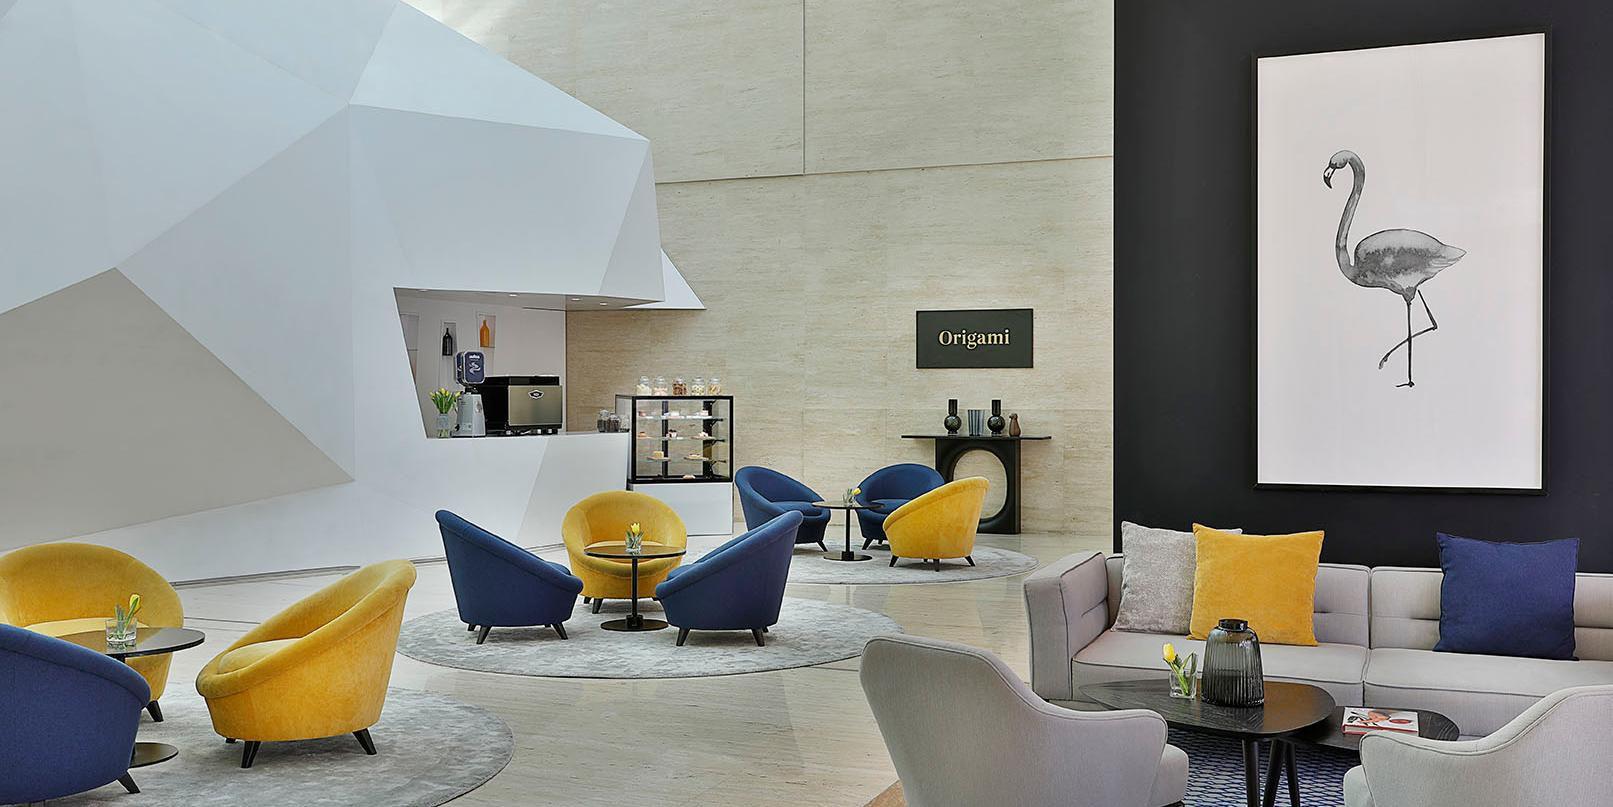 Origami Cafe, hotel lobby, voco Dubai, Sheikh Zayed Road